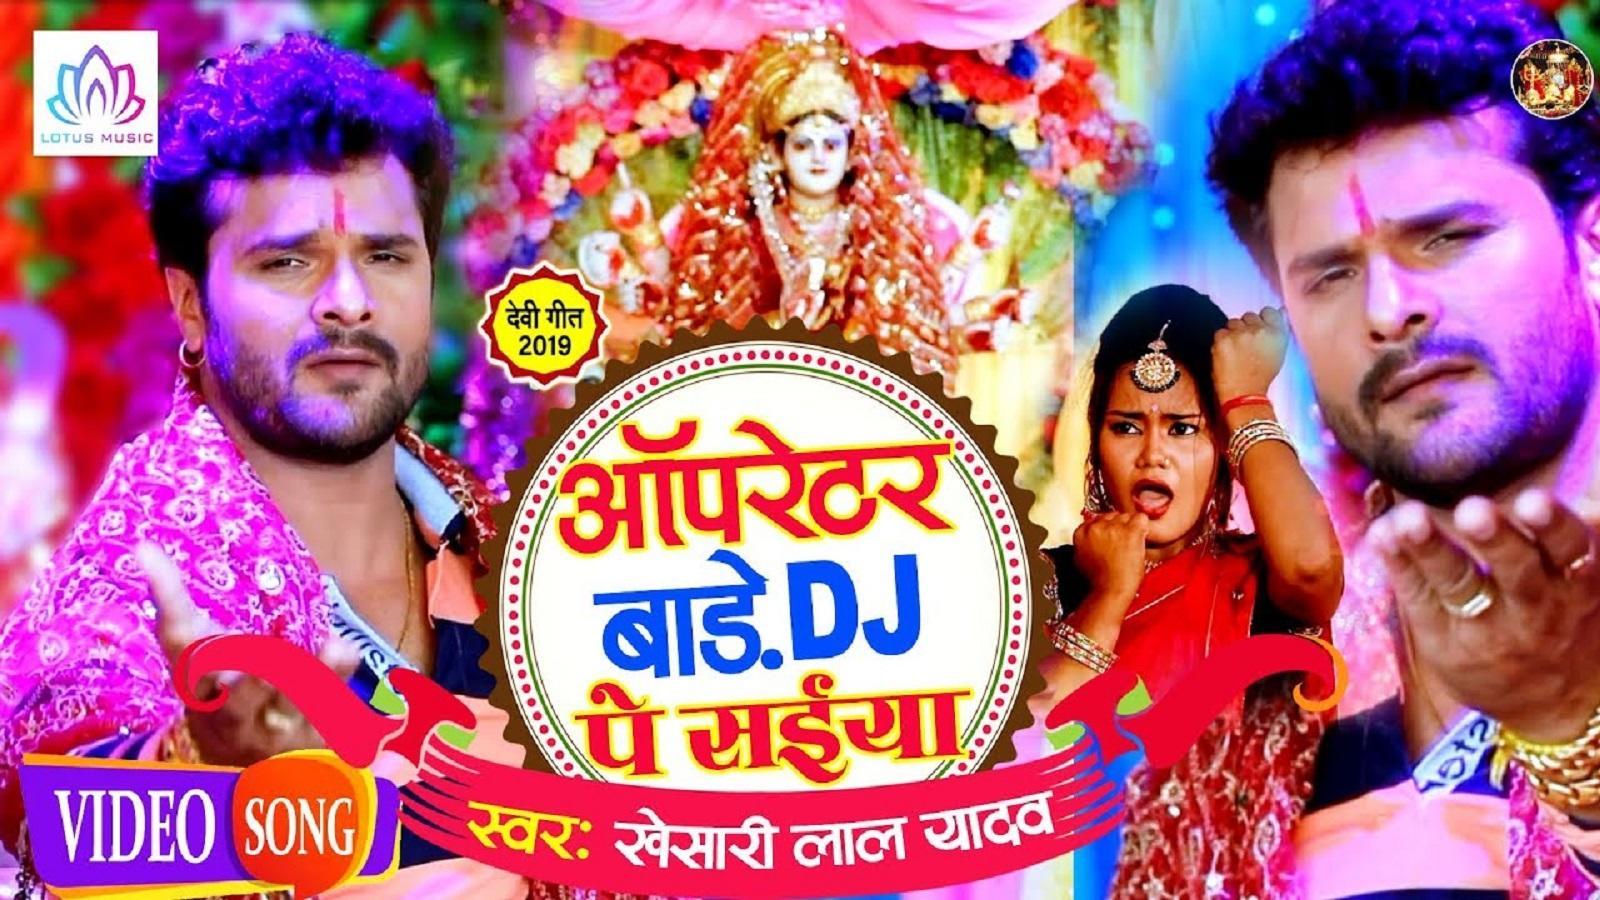 Watch Bhojpuri Gana Video Song: Khesari Lal Yadav's Bhojpuri song 'Operator  Baare DJ Pe Saiya'